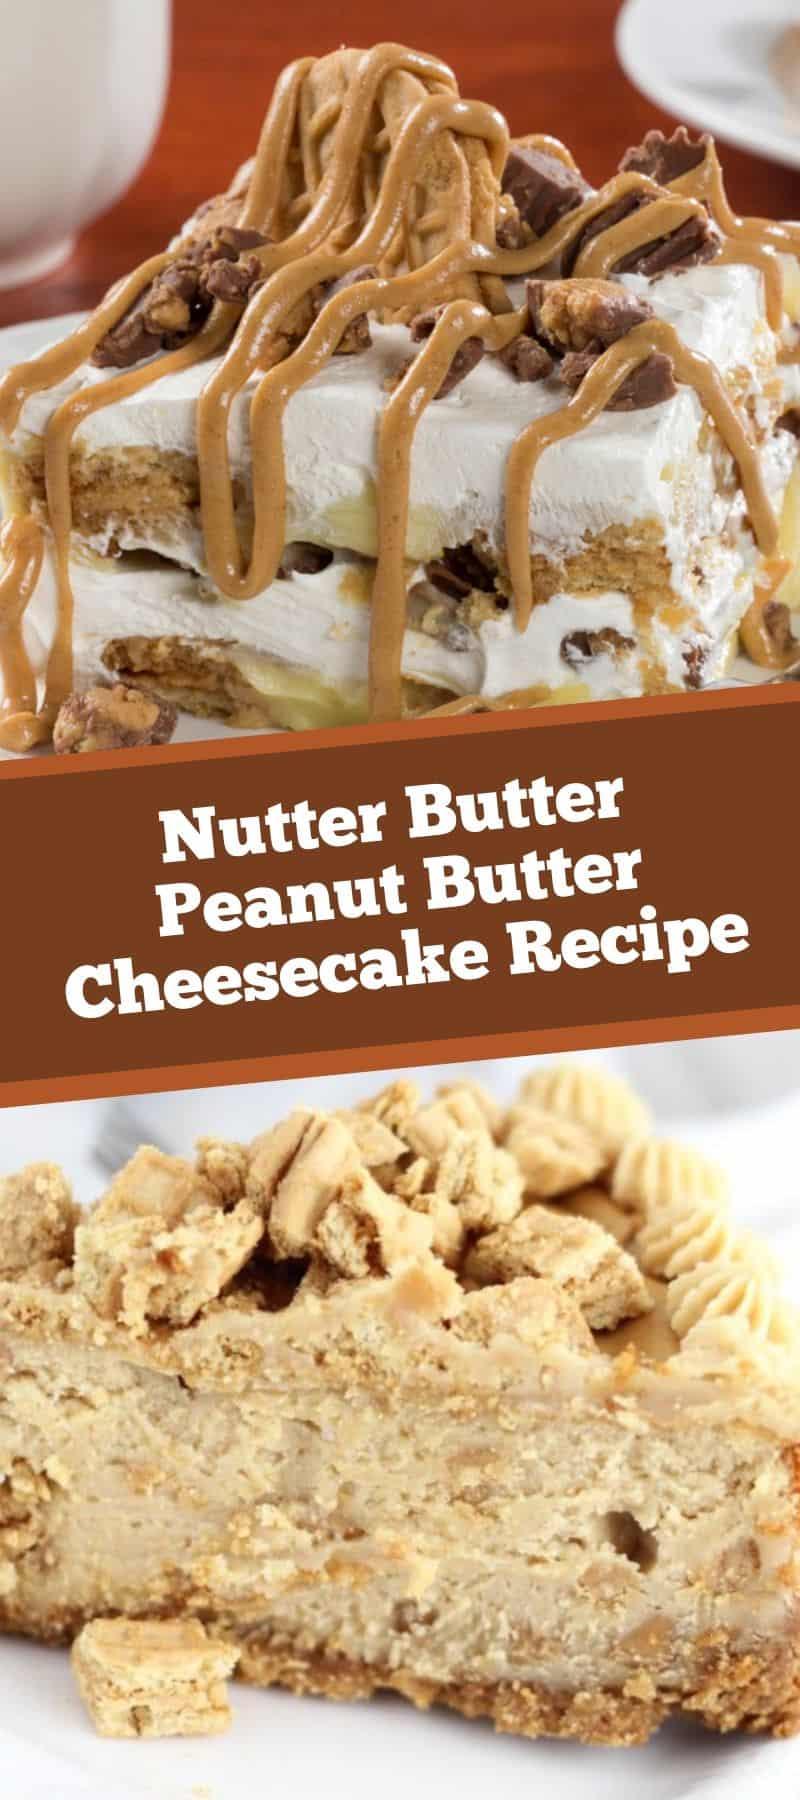 Nutter Butter Peanut Butter Cheesecake Recipe 3